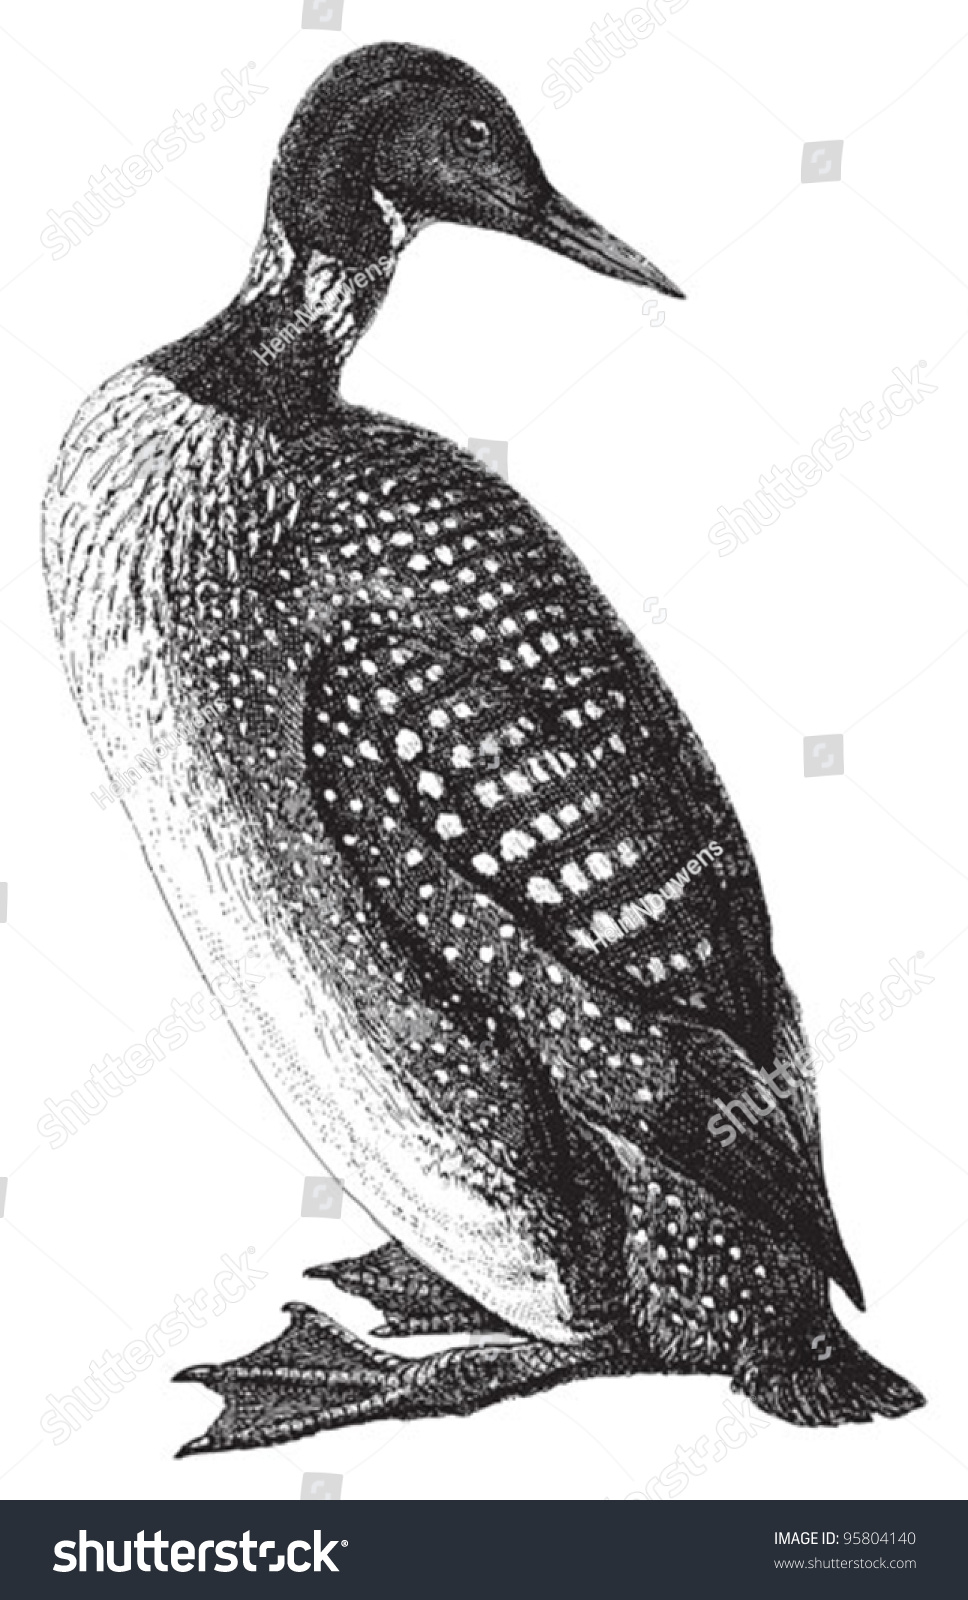 Common loon standing - photo#4